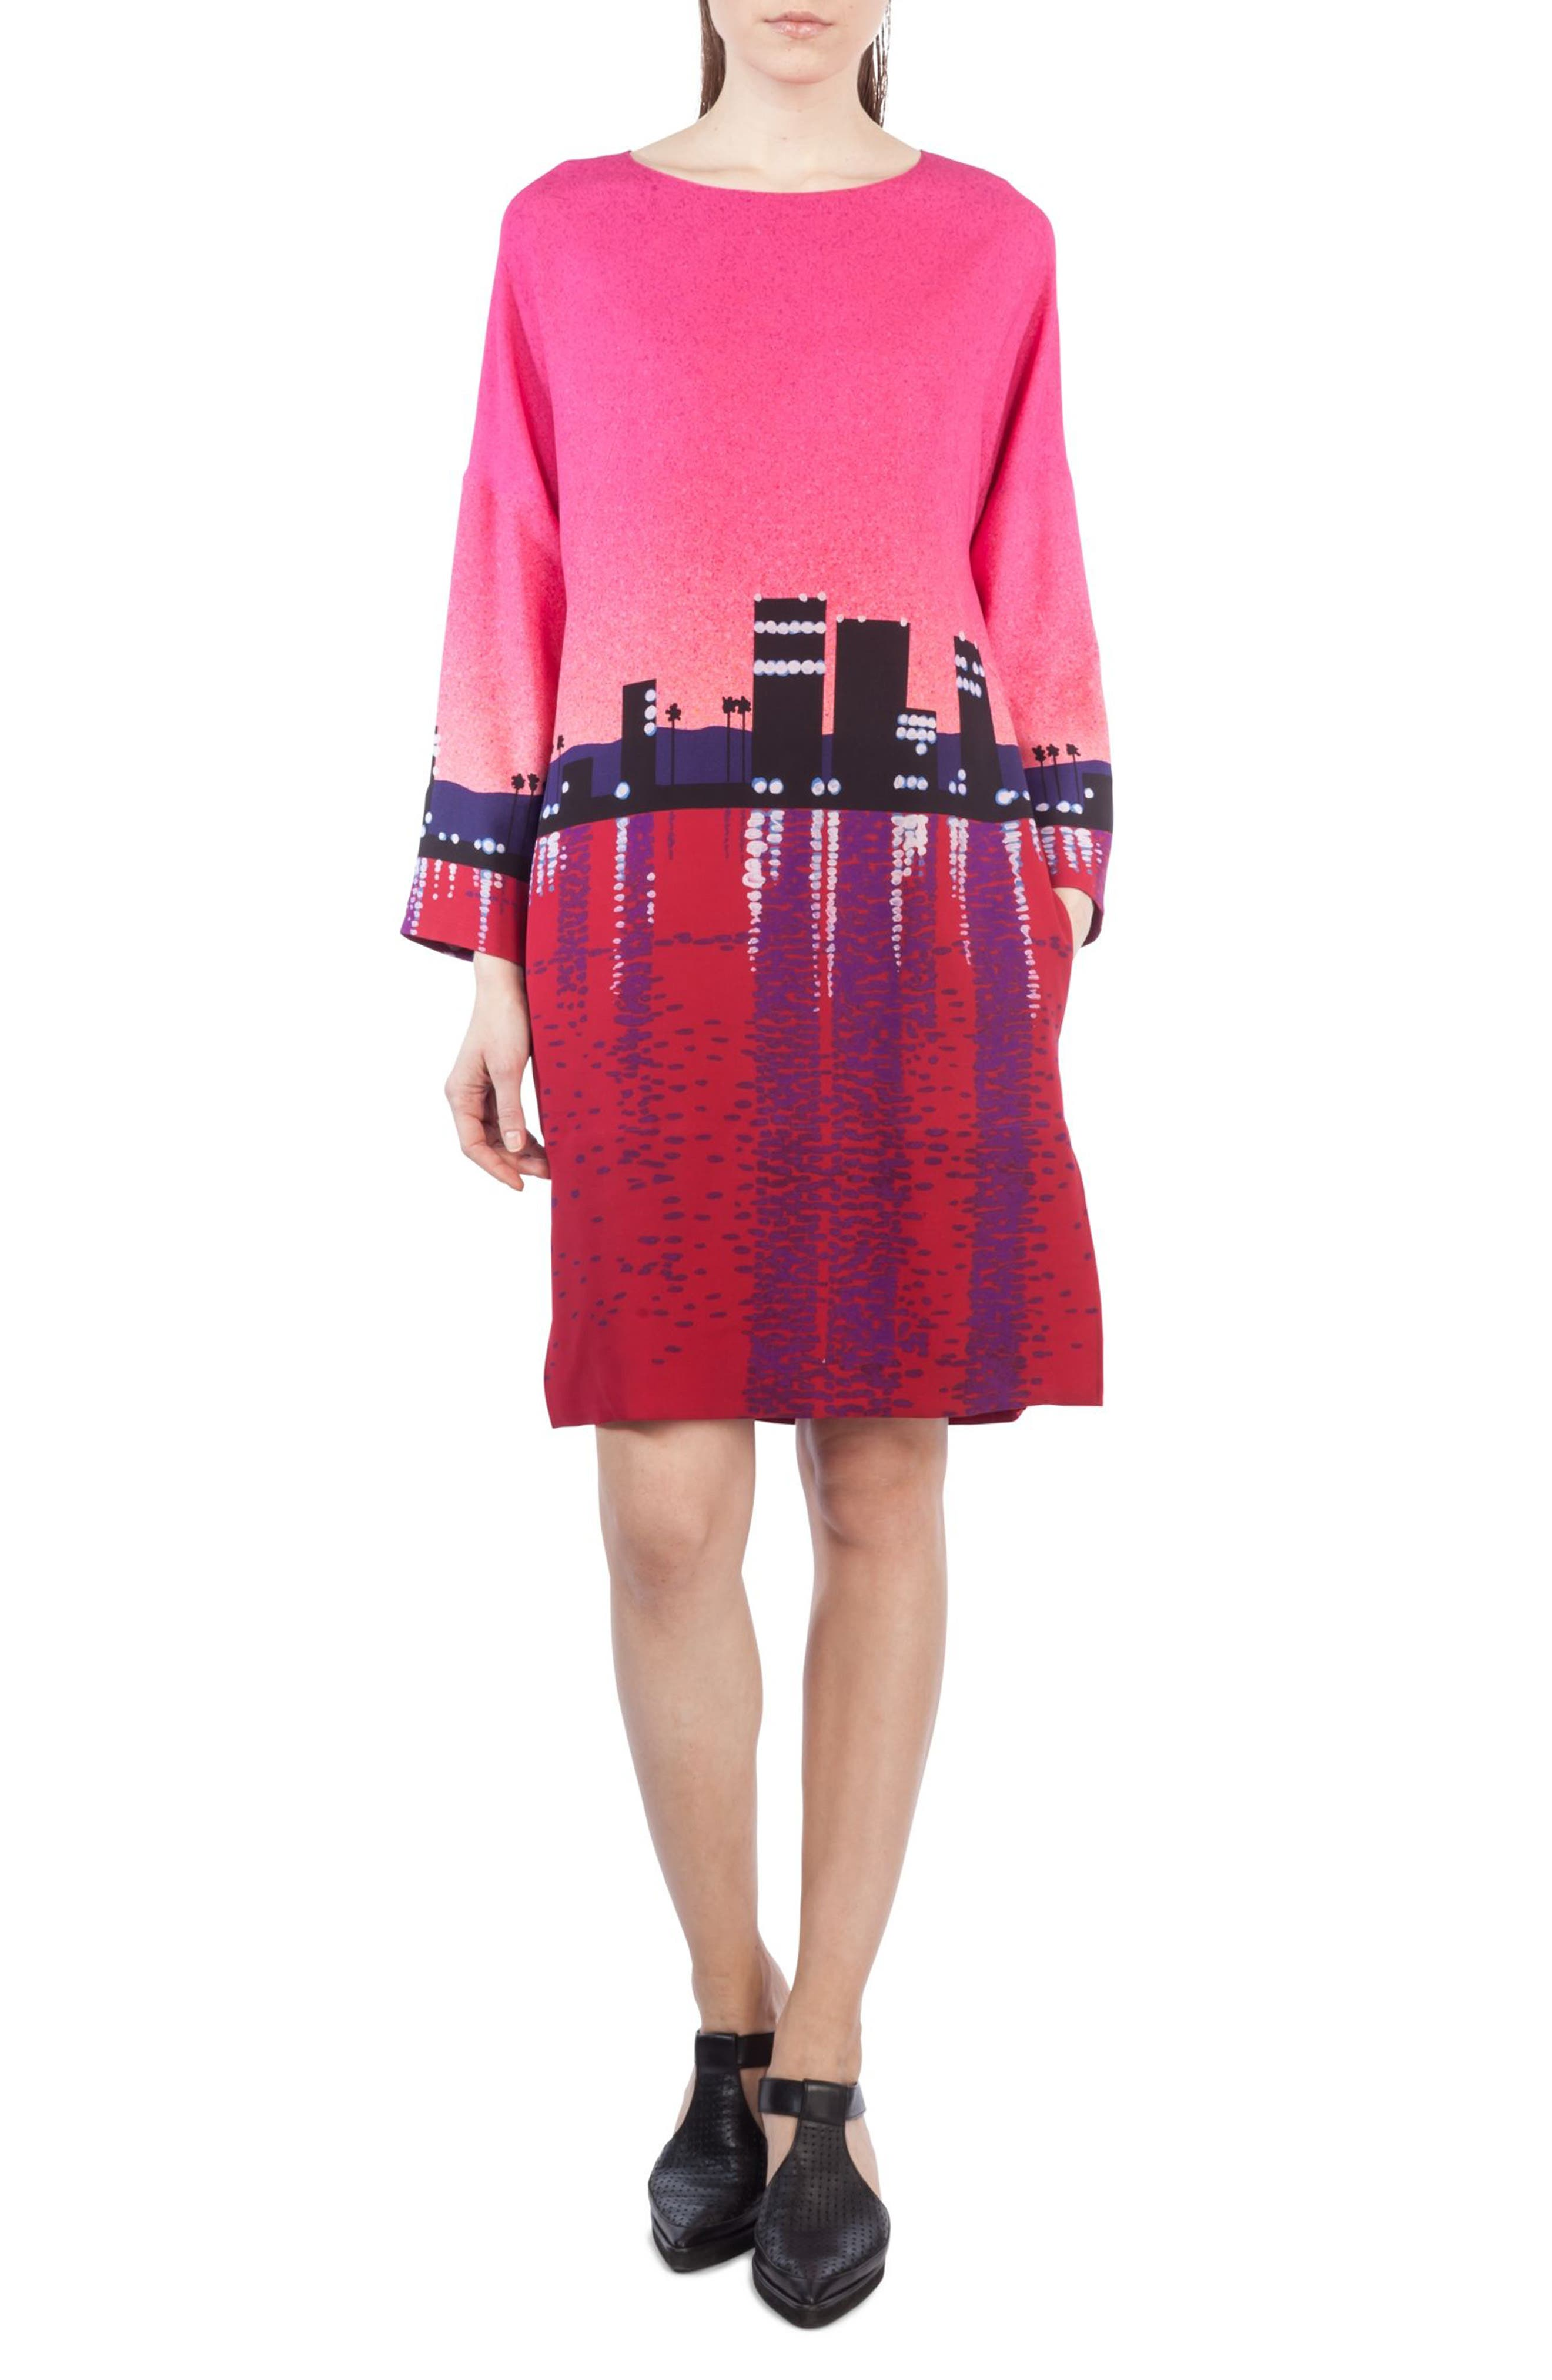 Sunset Print Shift Dress,                         Main,                         color, 650